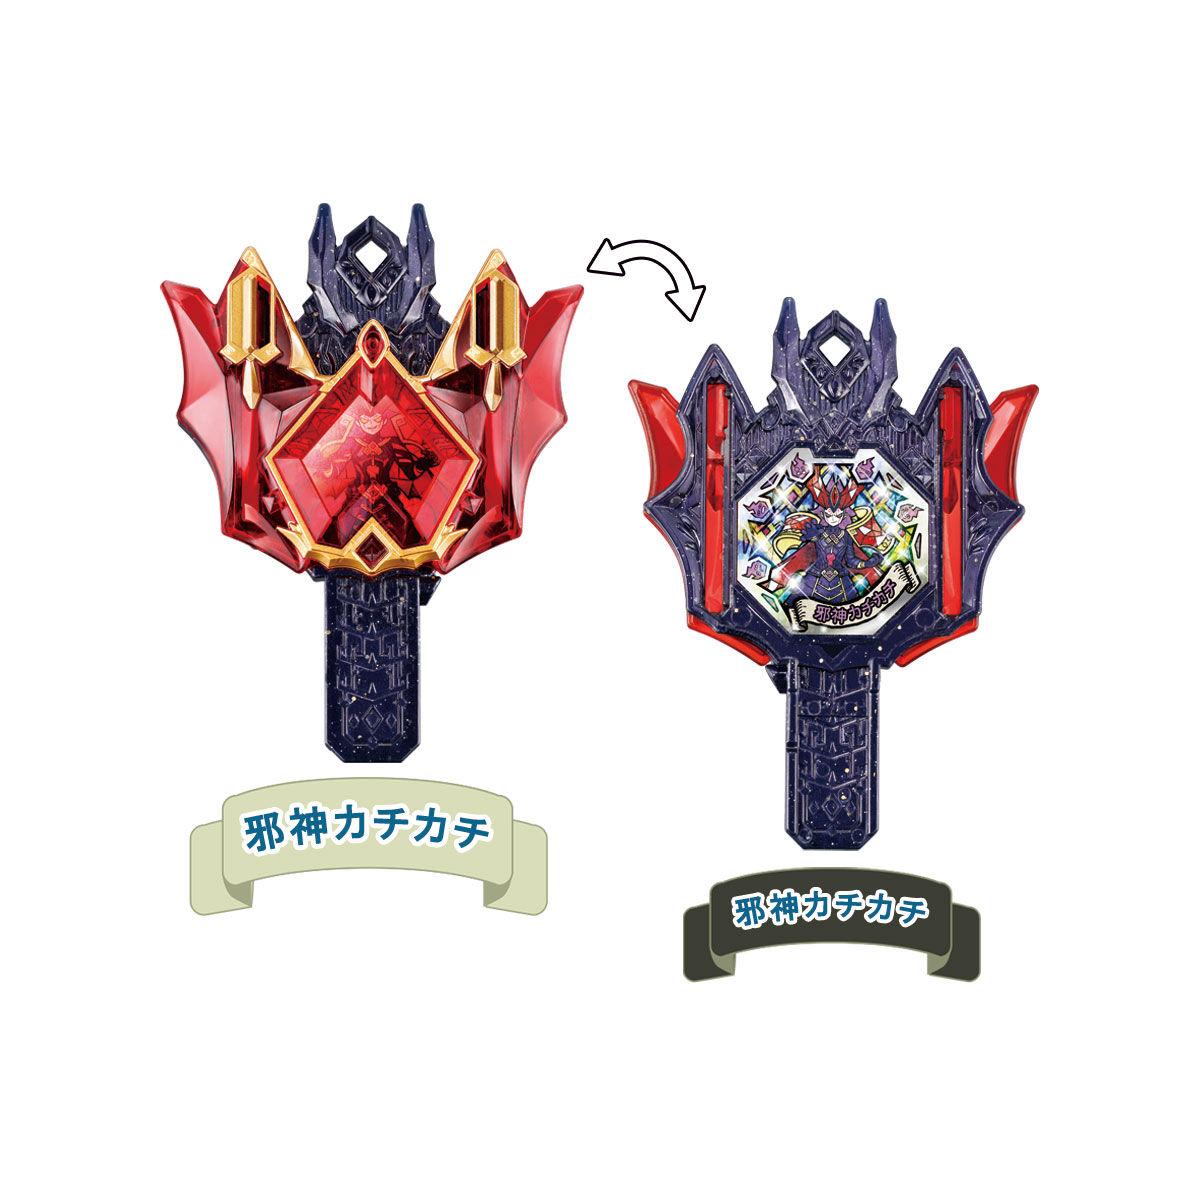 DX妖怪アークシリーズ03 妖魔一武道会 邪神カチカチ